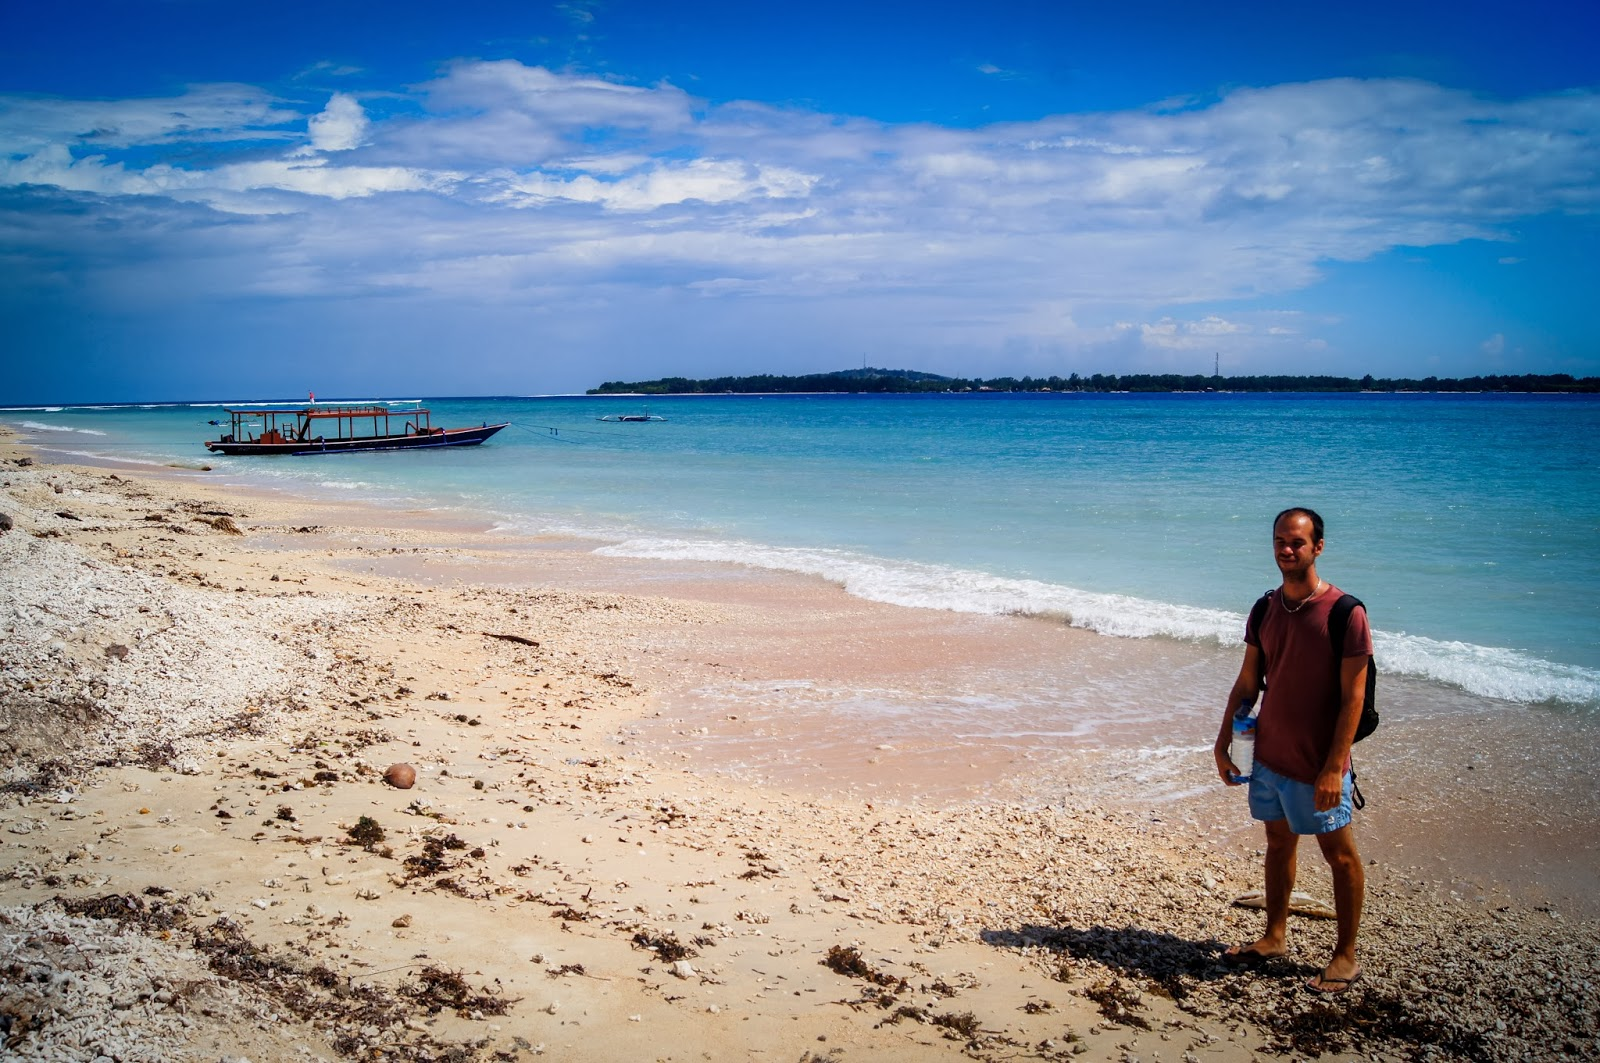 Playas de Gili Air